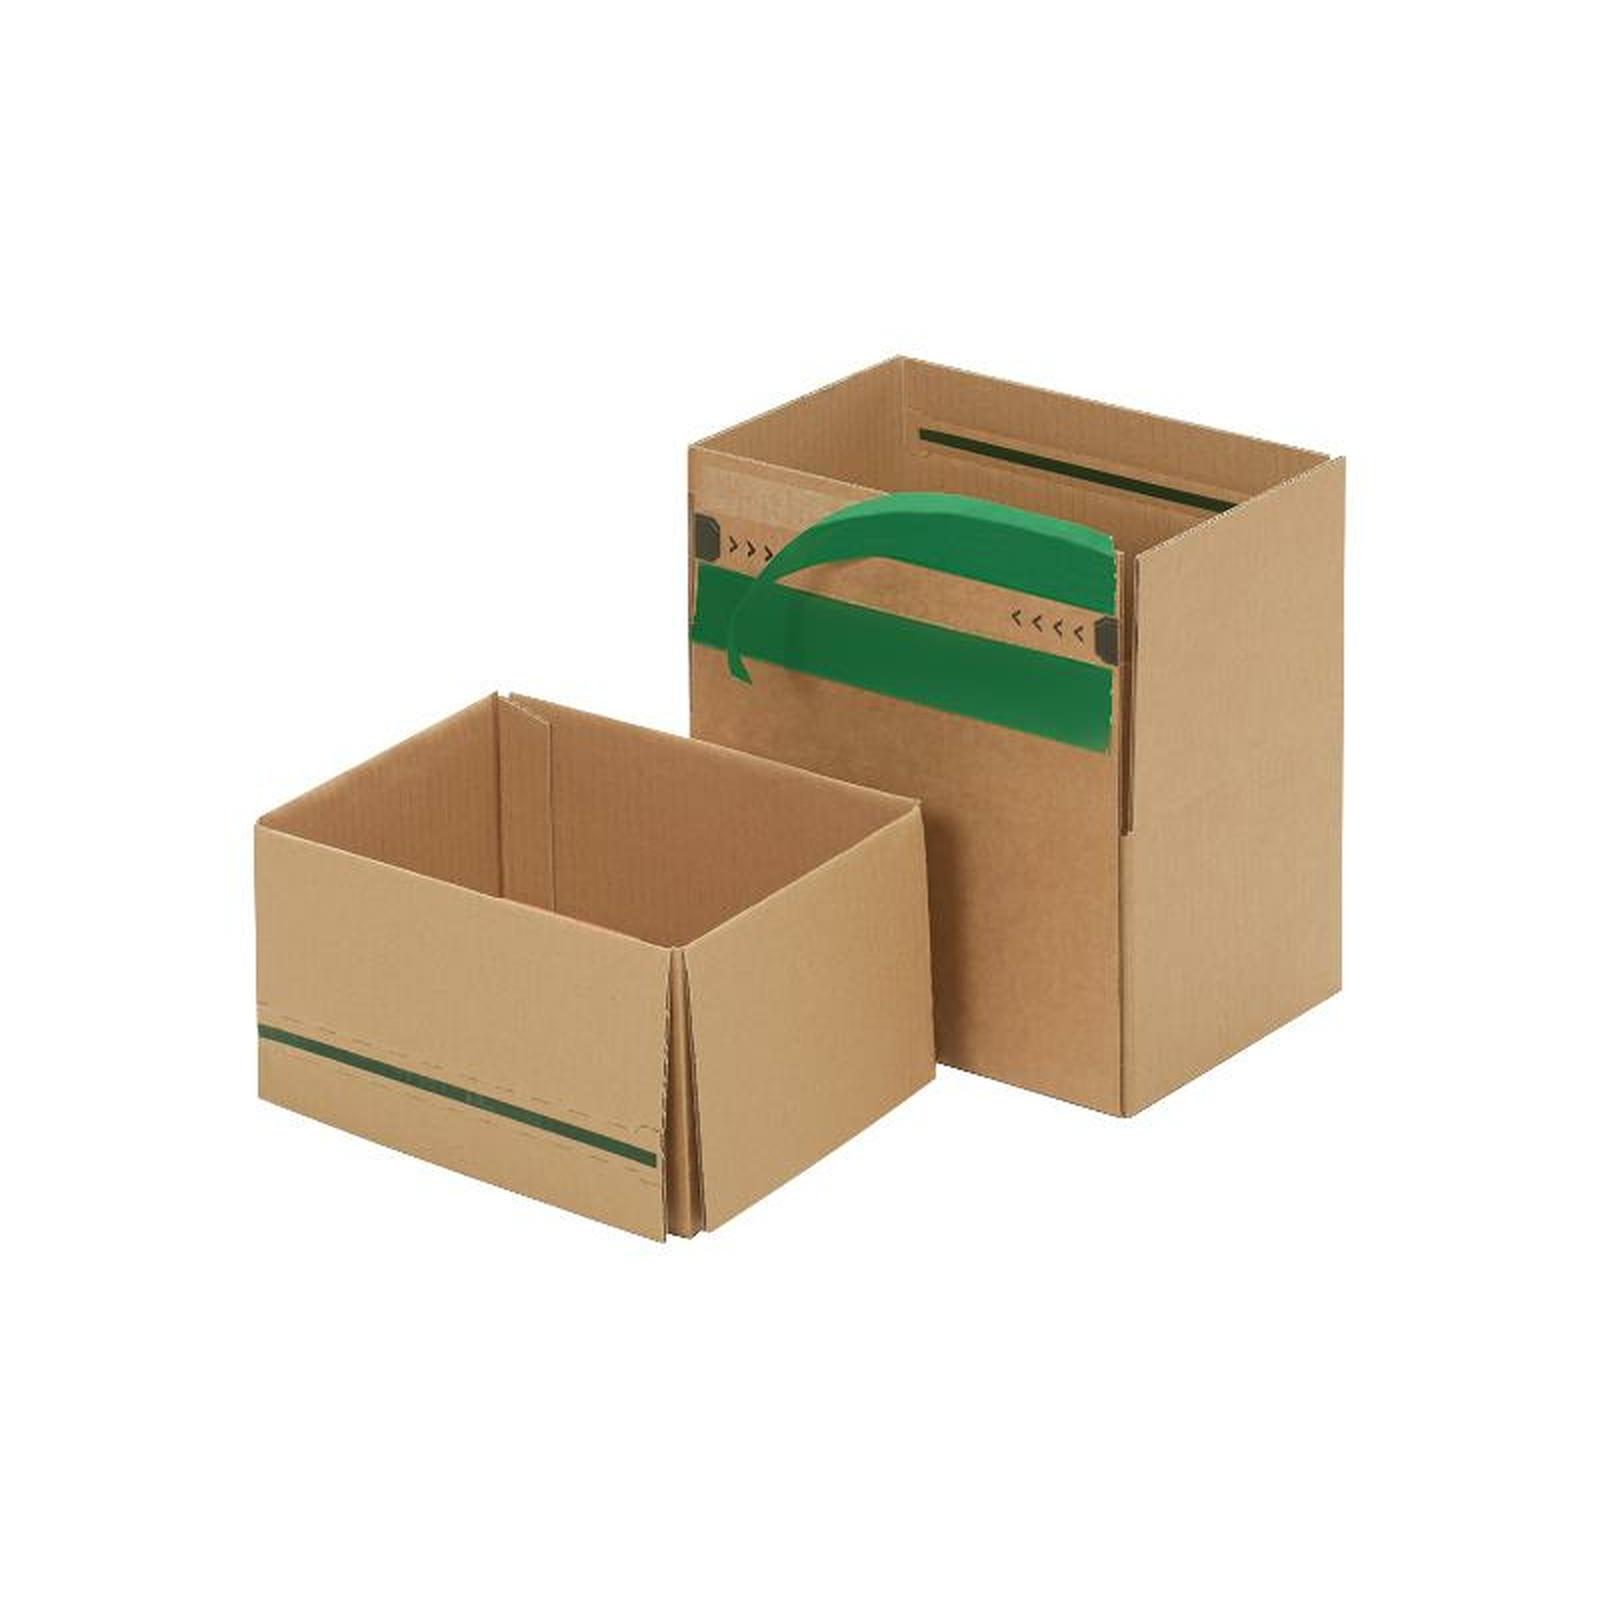 wiederverschlie bare kartons 230x165x115 mm g nstig kaufen 0 39. Black Bedroom Furniture Sets. Home Design Ideas